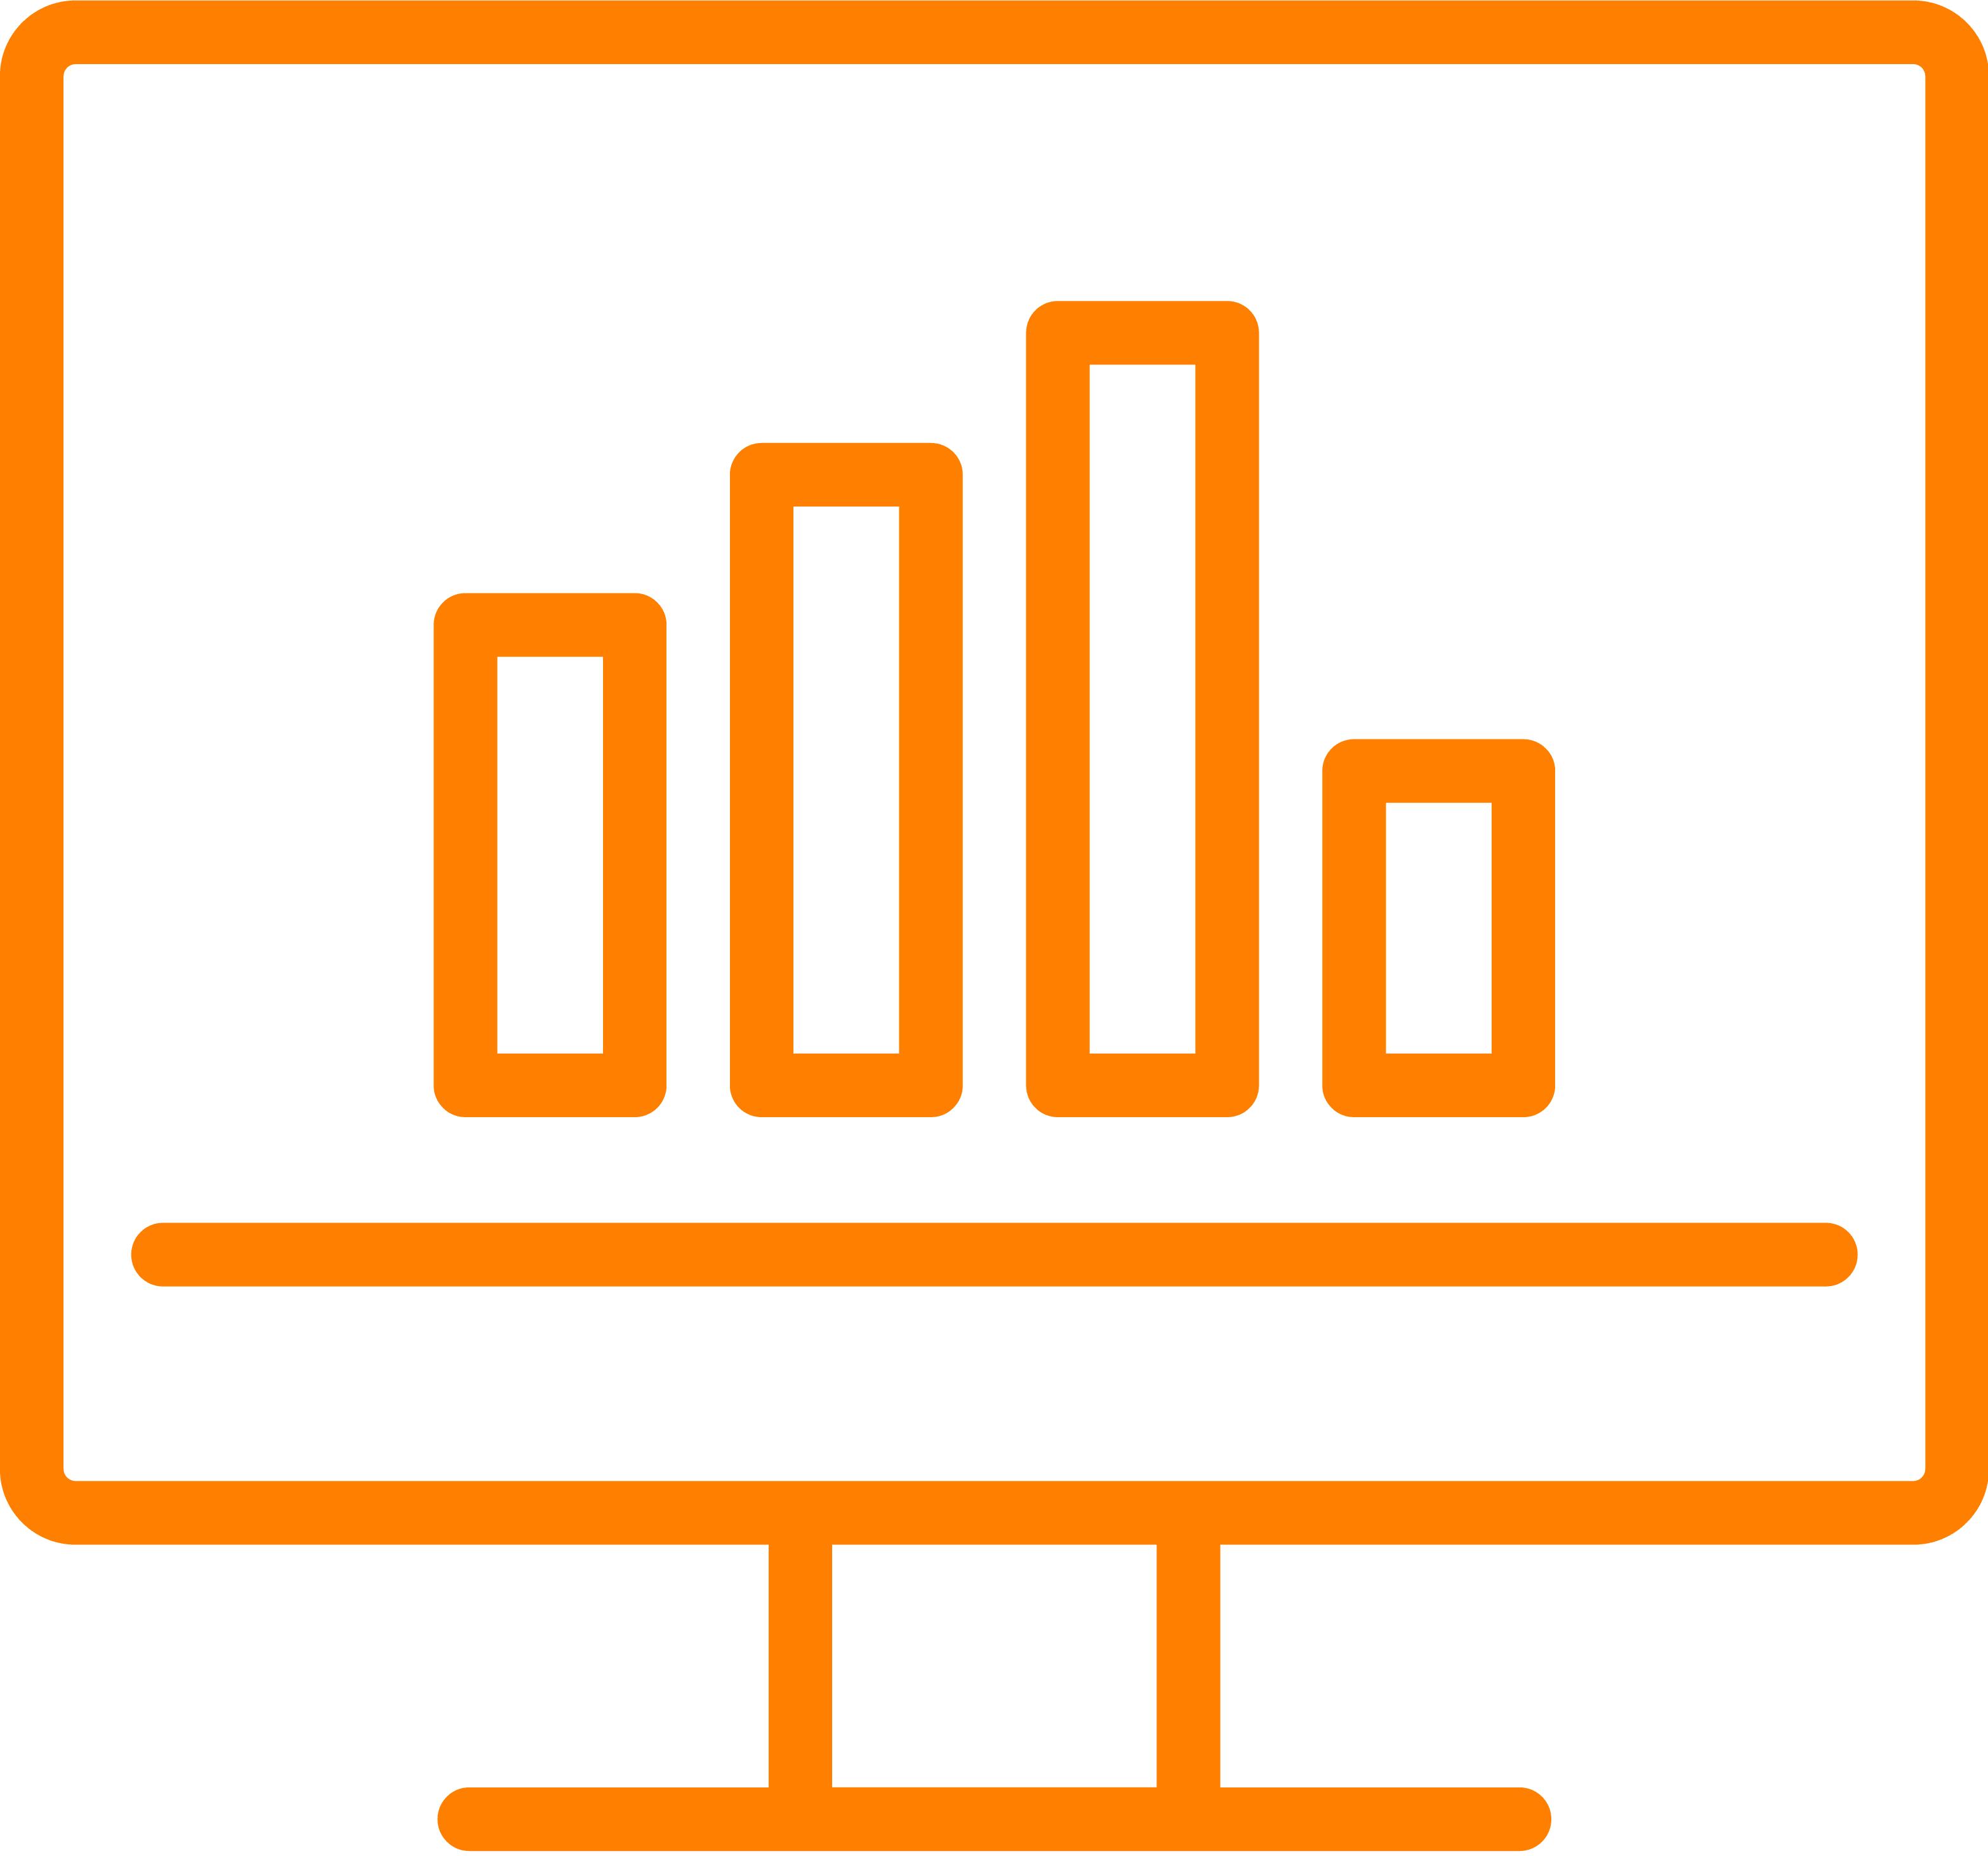 Icoon staafdiagram